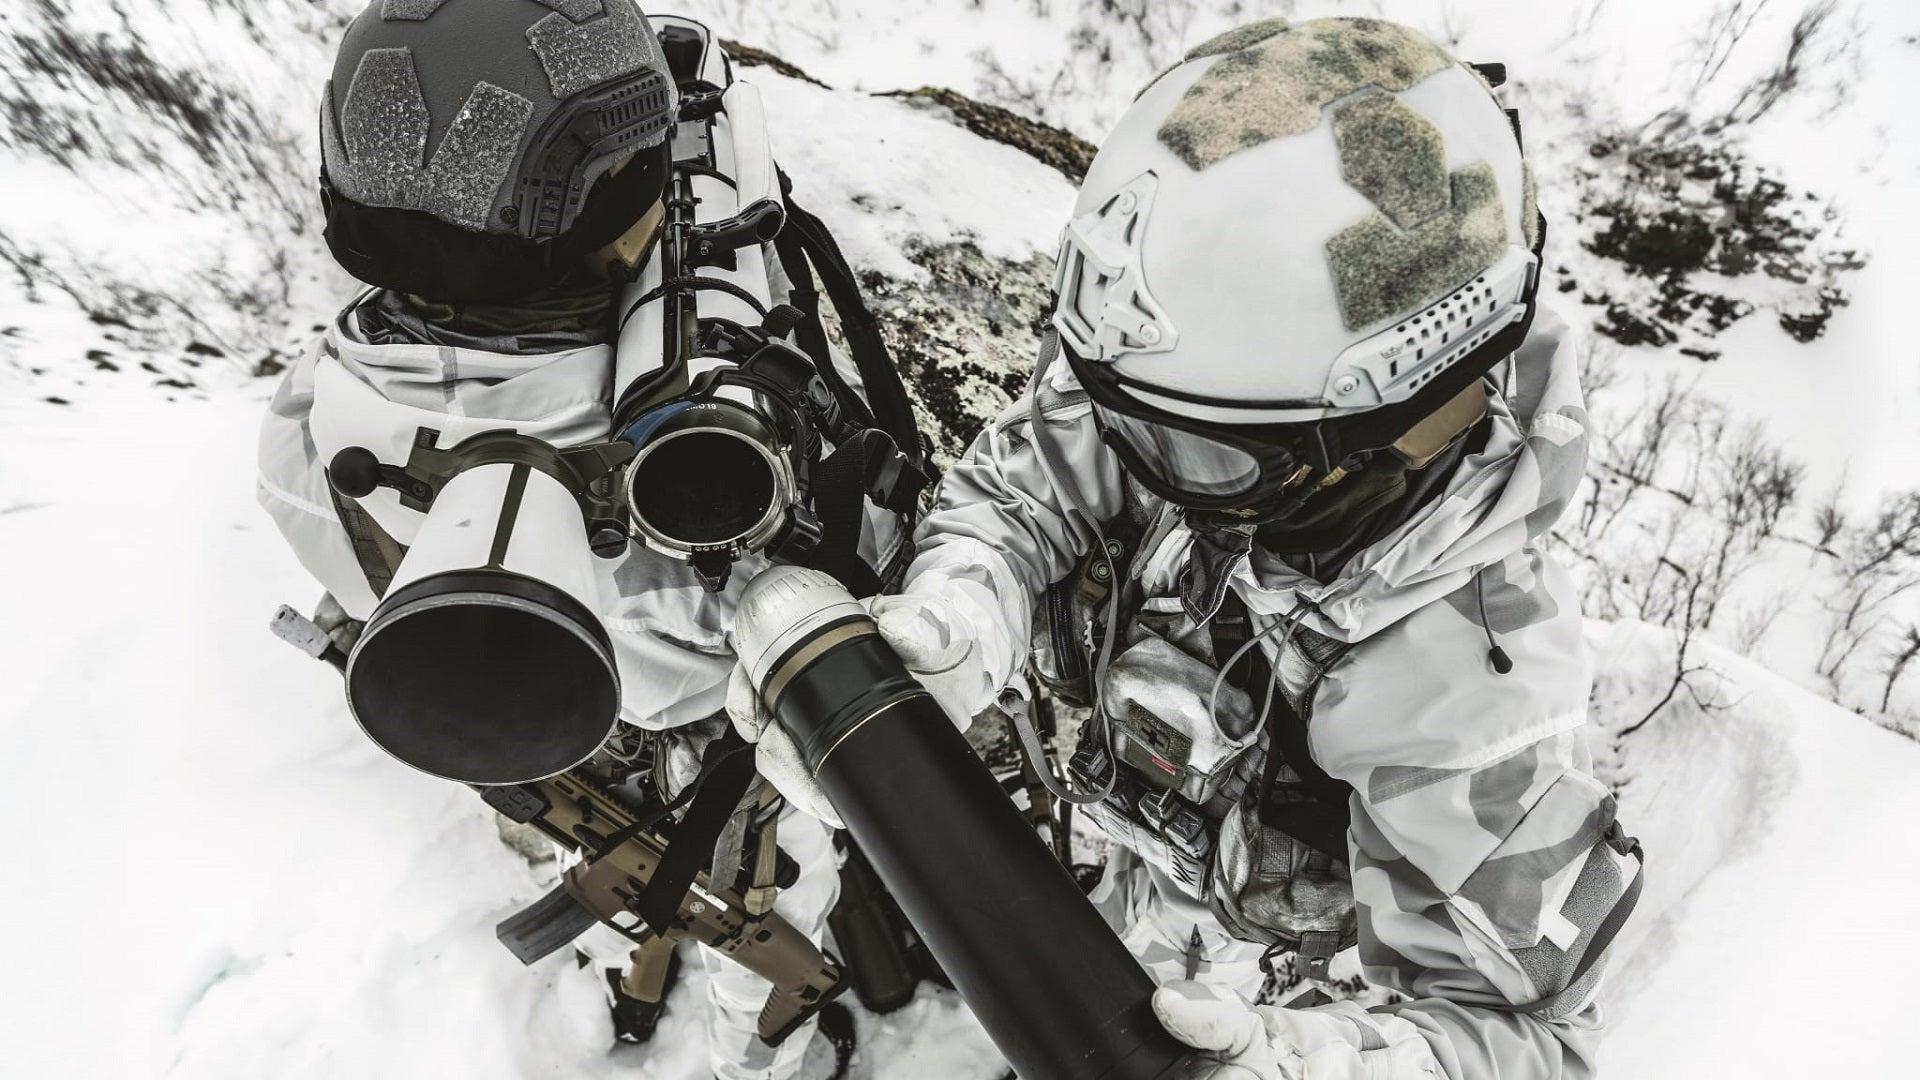 Saab لتسليم Carl-Gustaf M4 والذخيرة إلى عميل لم يكشف عنه